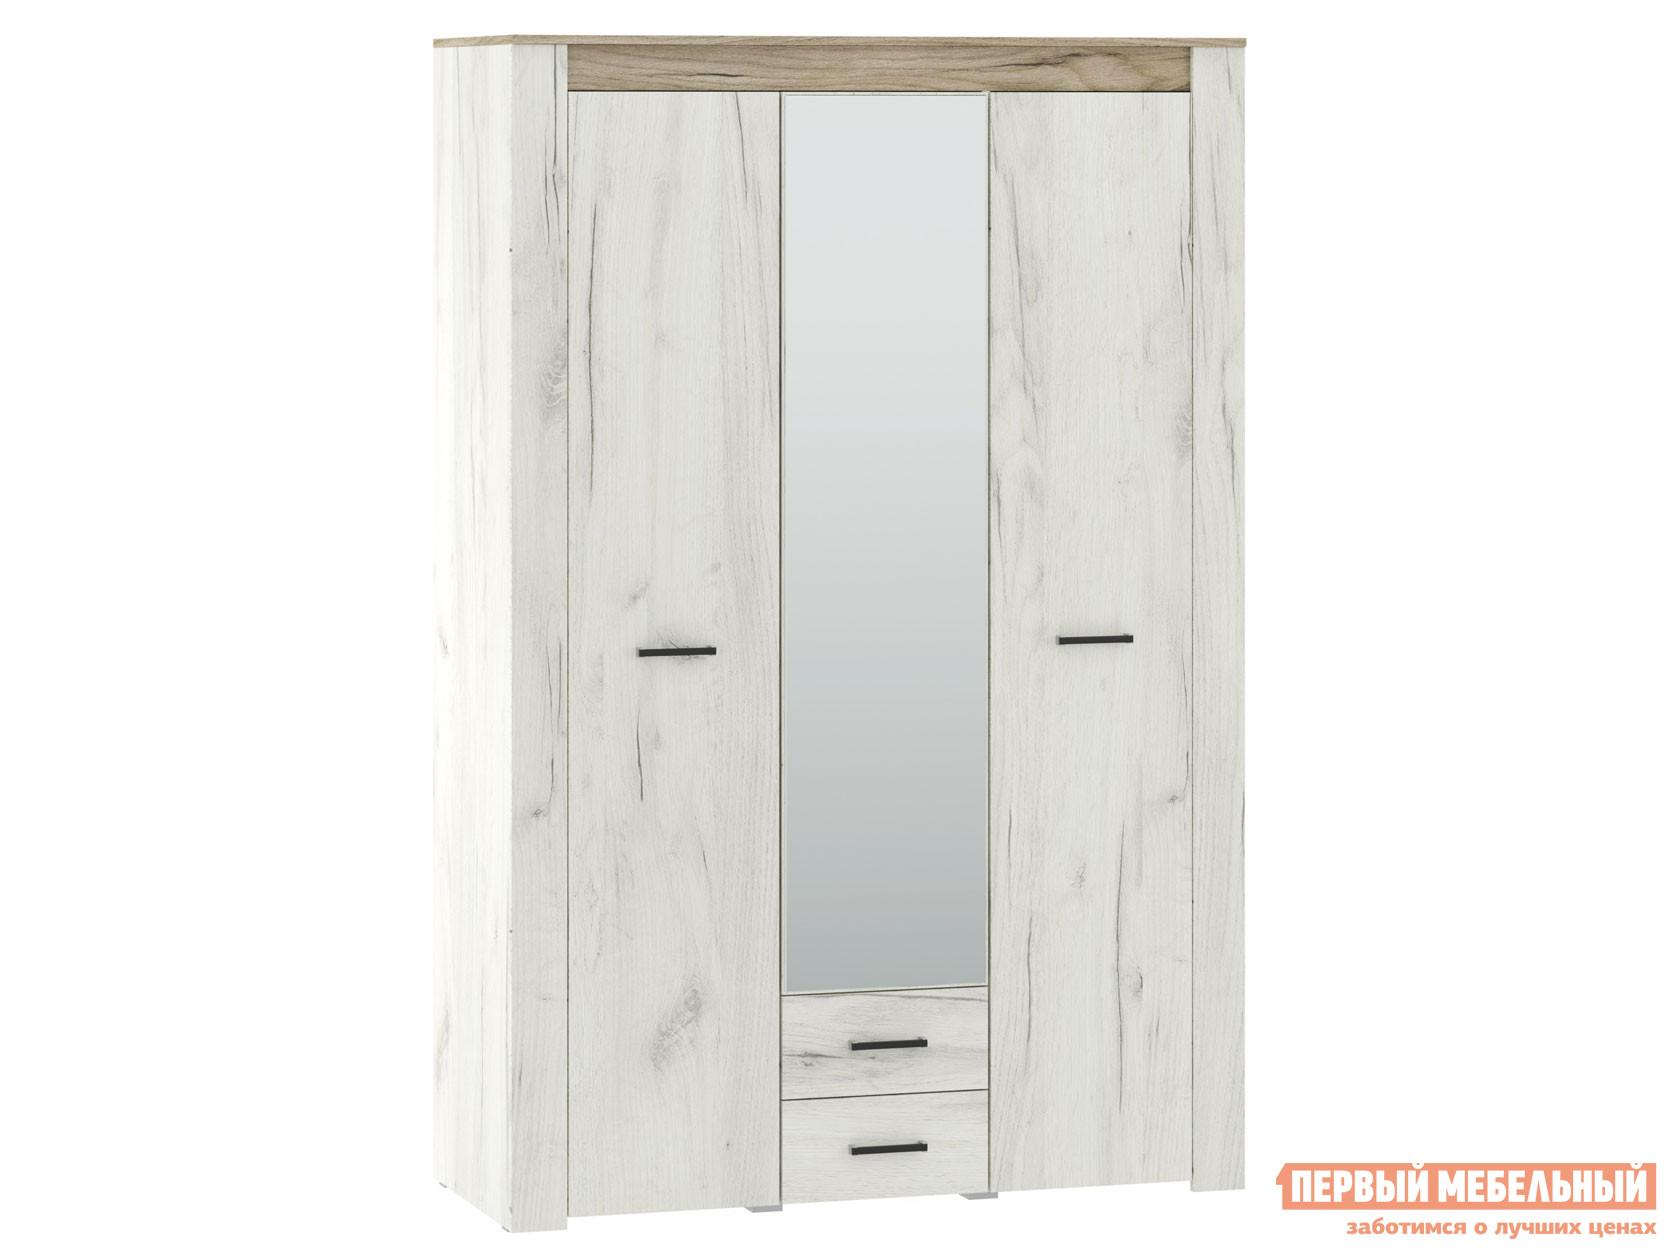 Шкаф распашной НК-Мебель ПРАГА шкаф 3-х дверный 72030102 шкаф распашной нк мебель прага шкаф 4 х дверный 72030103